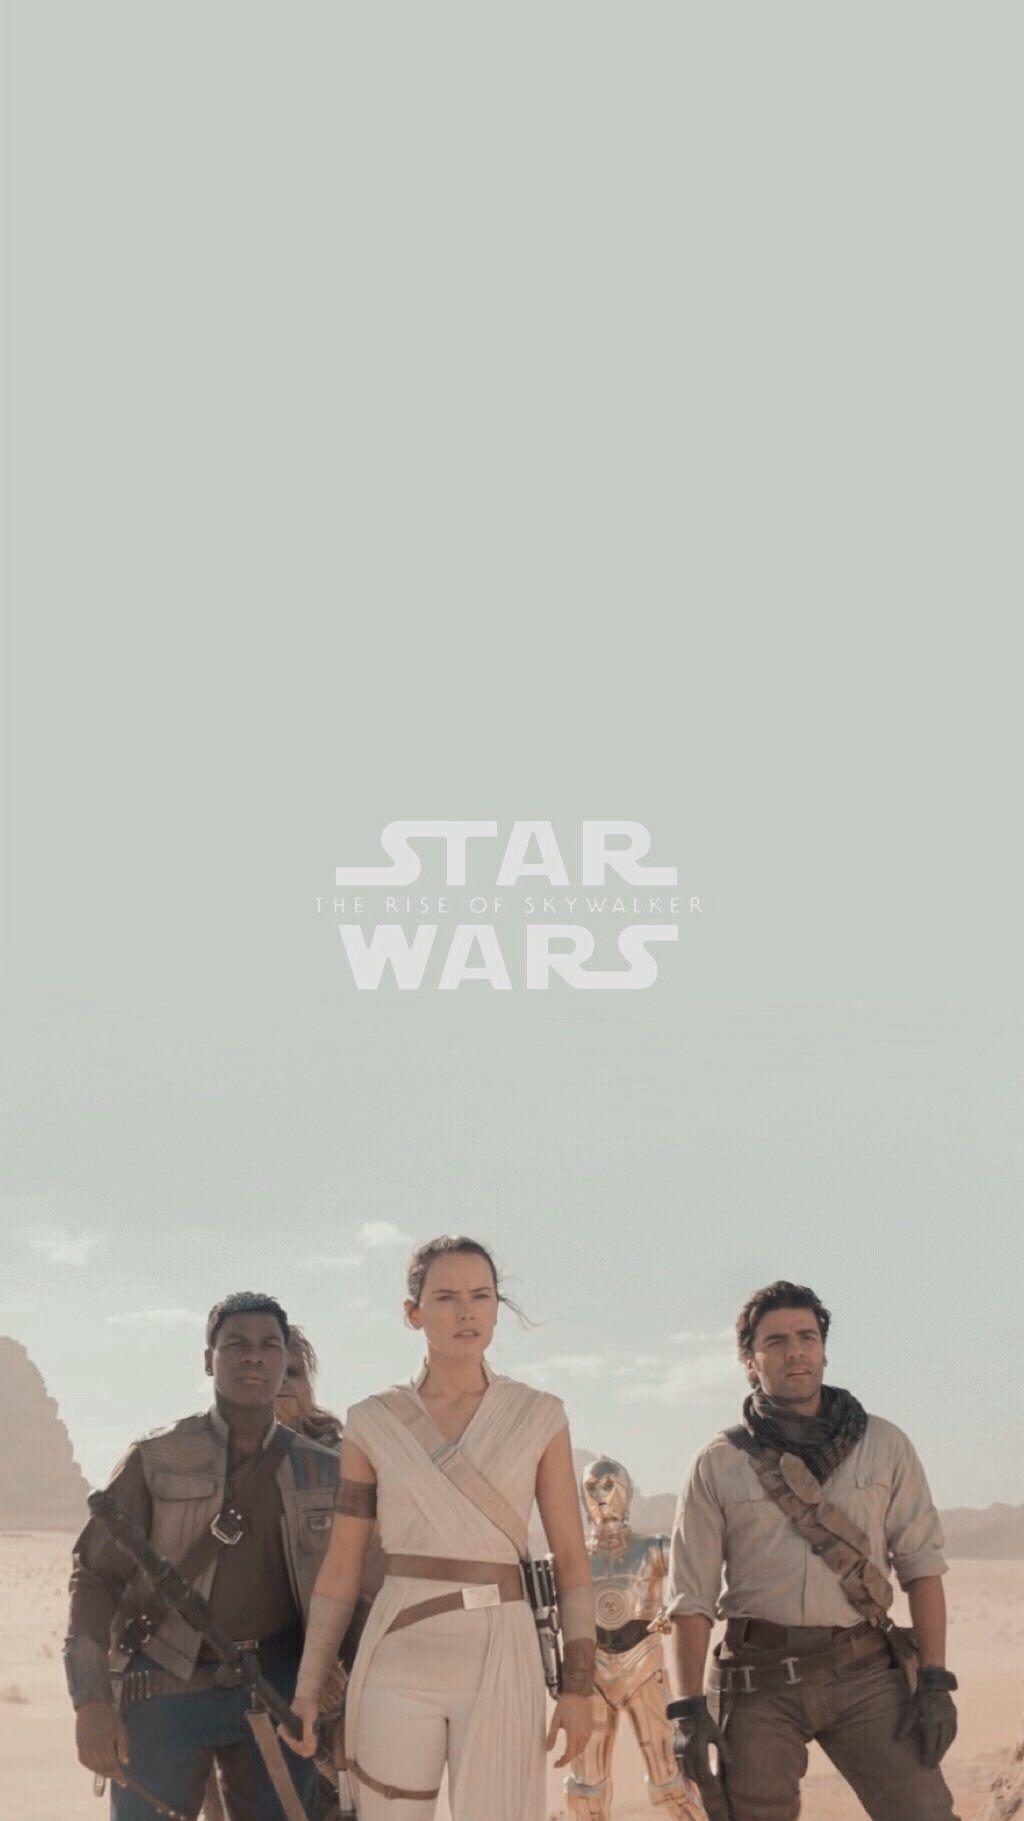 Wallpapers Headers On Twitter Star Wars Wallpaper Star Wars Pictures Star Wars Wallpaper Iphone